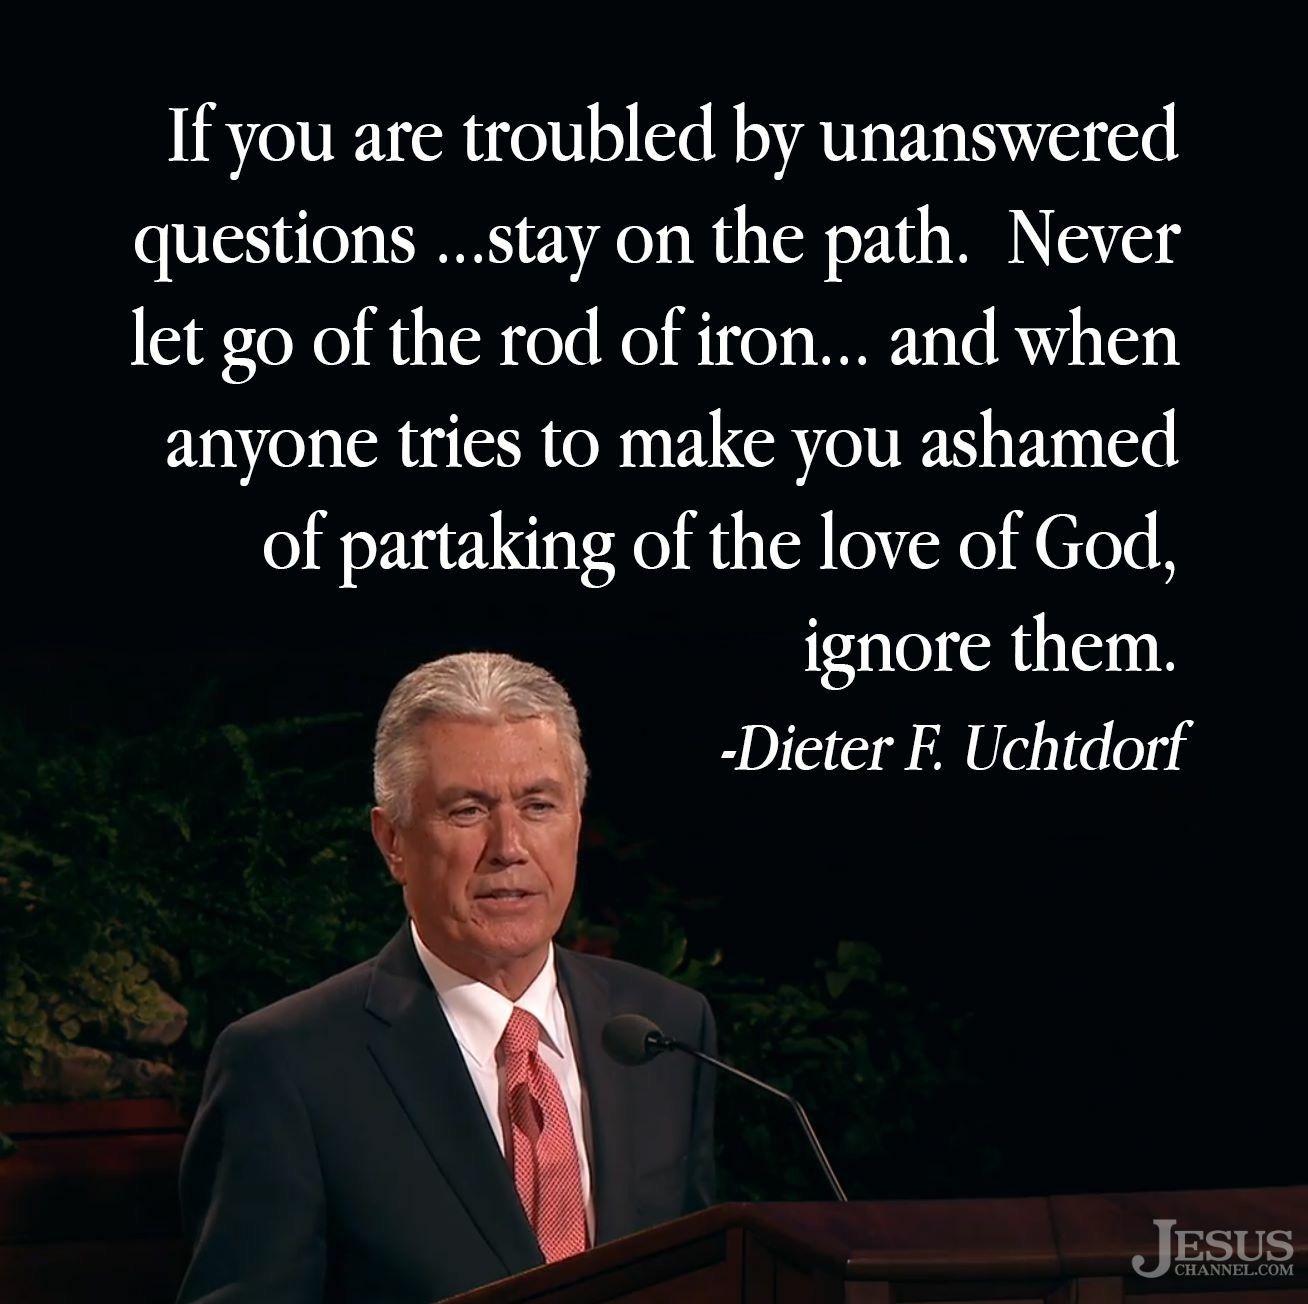 Deiters Zitate Zum Thema Jesus Christus Evangeliums Zitate Mormonen Zitate Lds Zitate